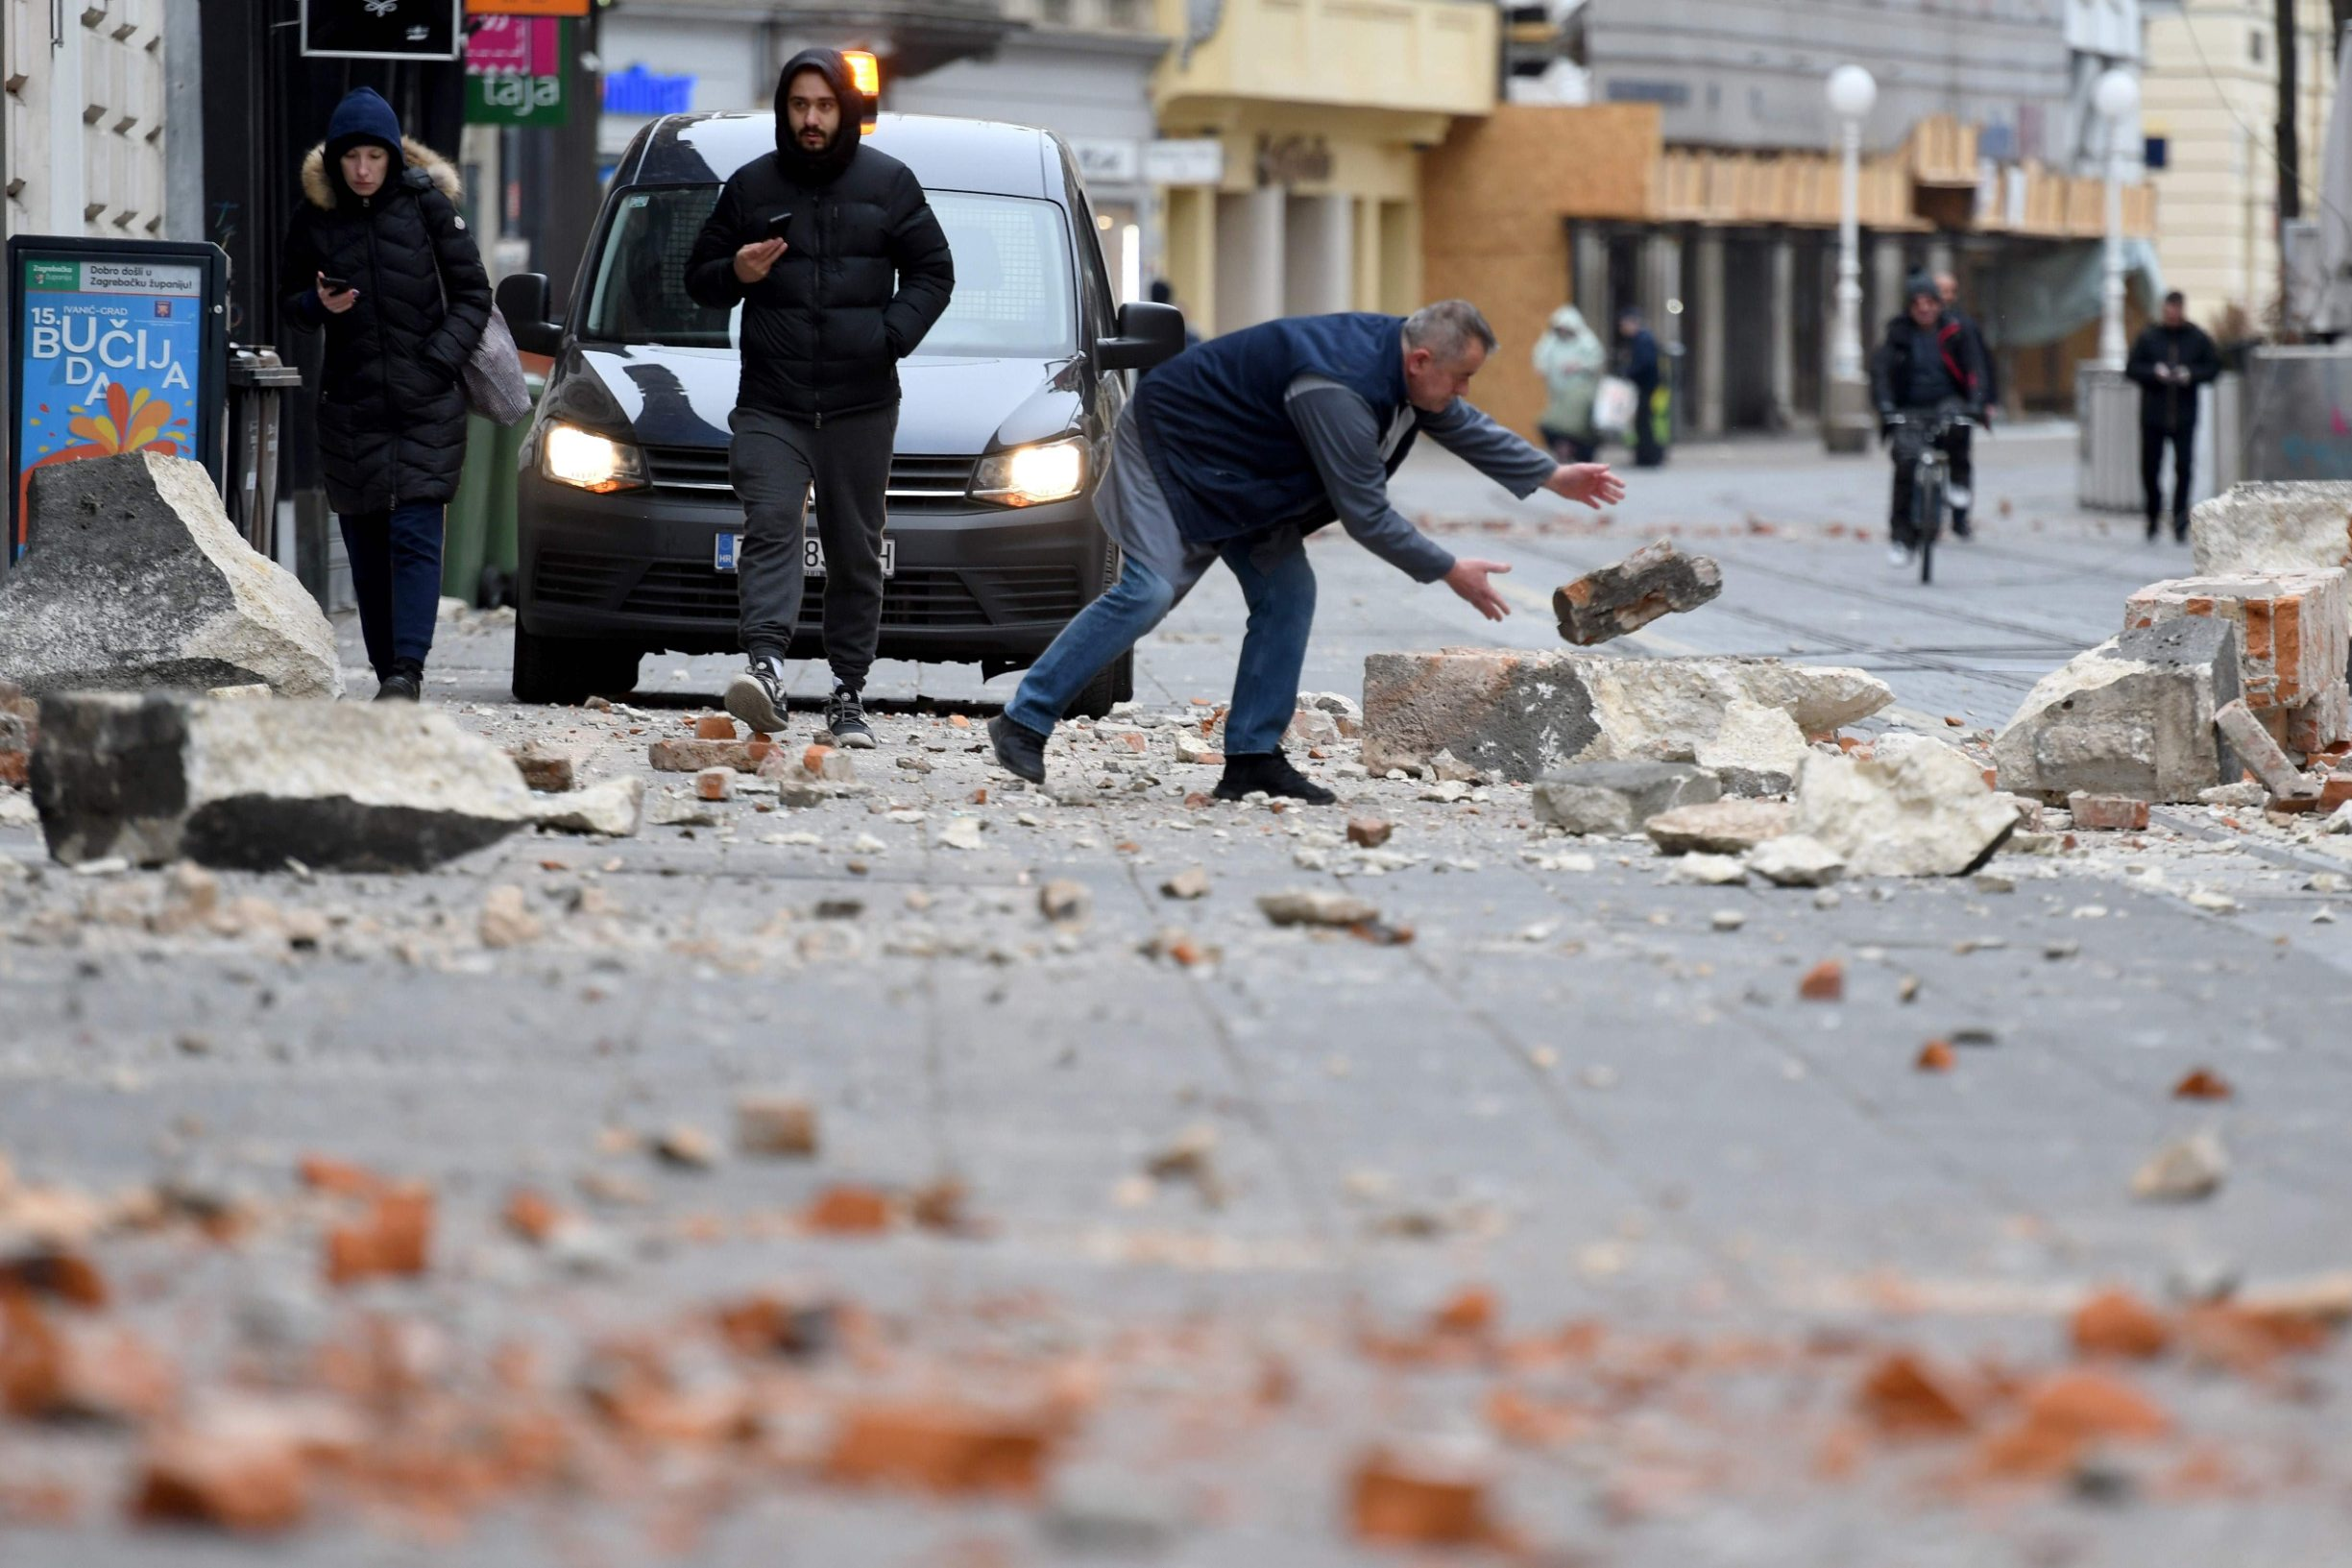 Agencija AFP objavila je sliku raščišćavanja središta Zagreba